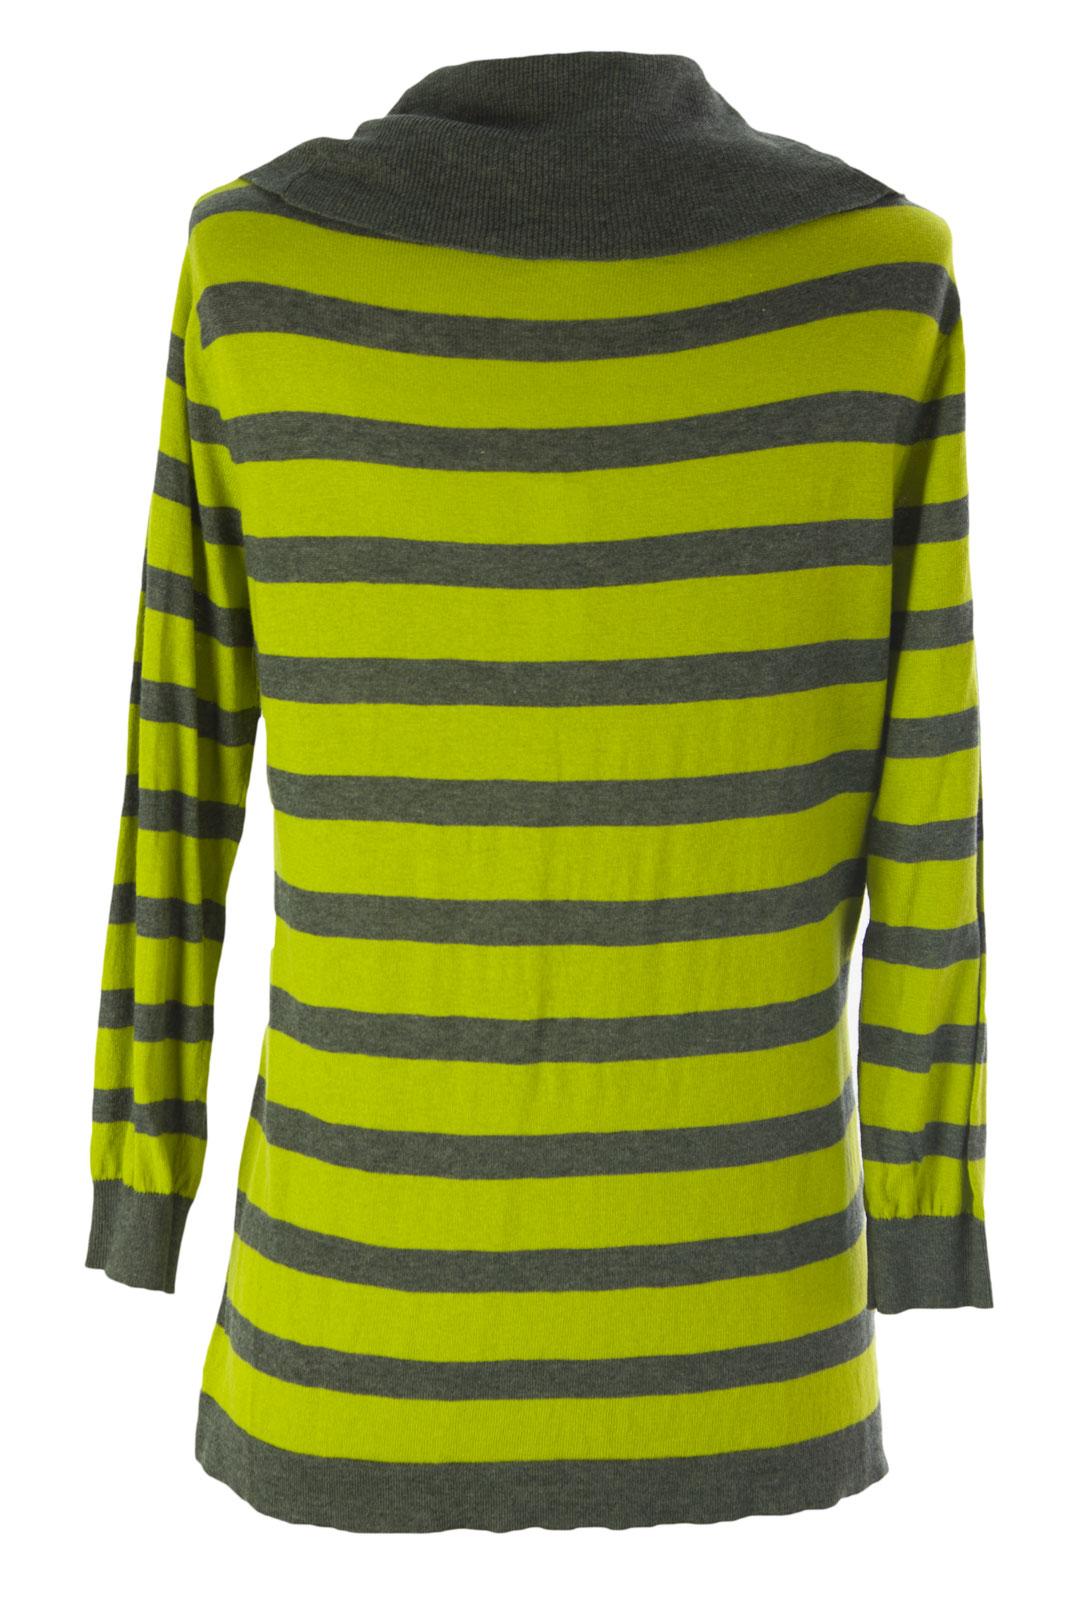 August Silk Women/'s Striped Cowl Neck Sweater NWT $58